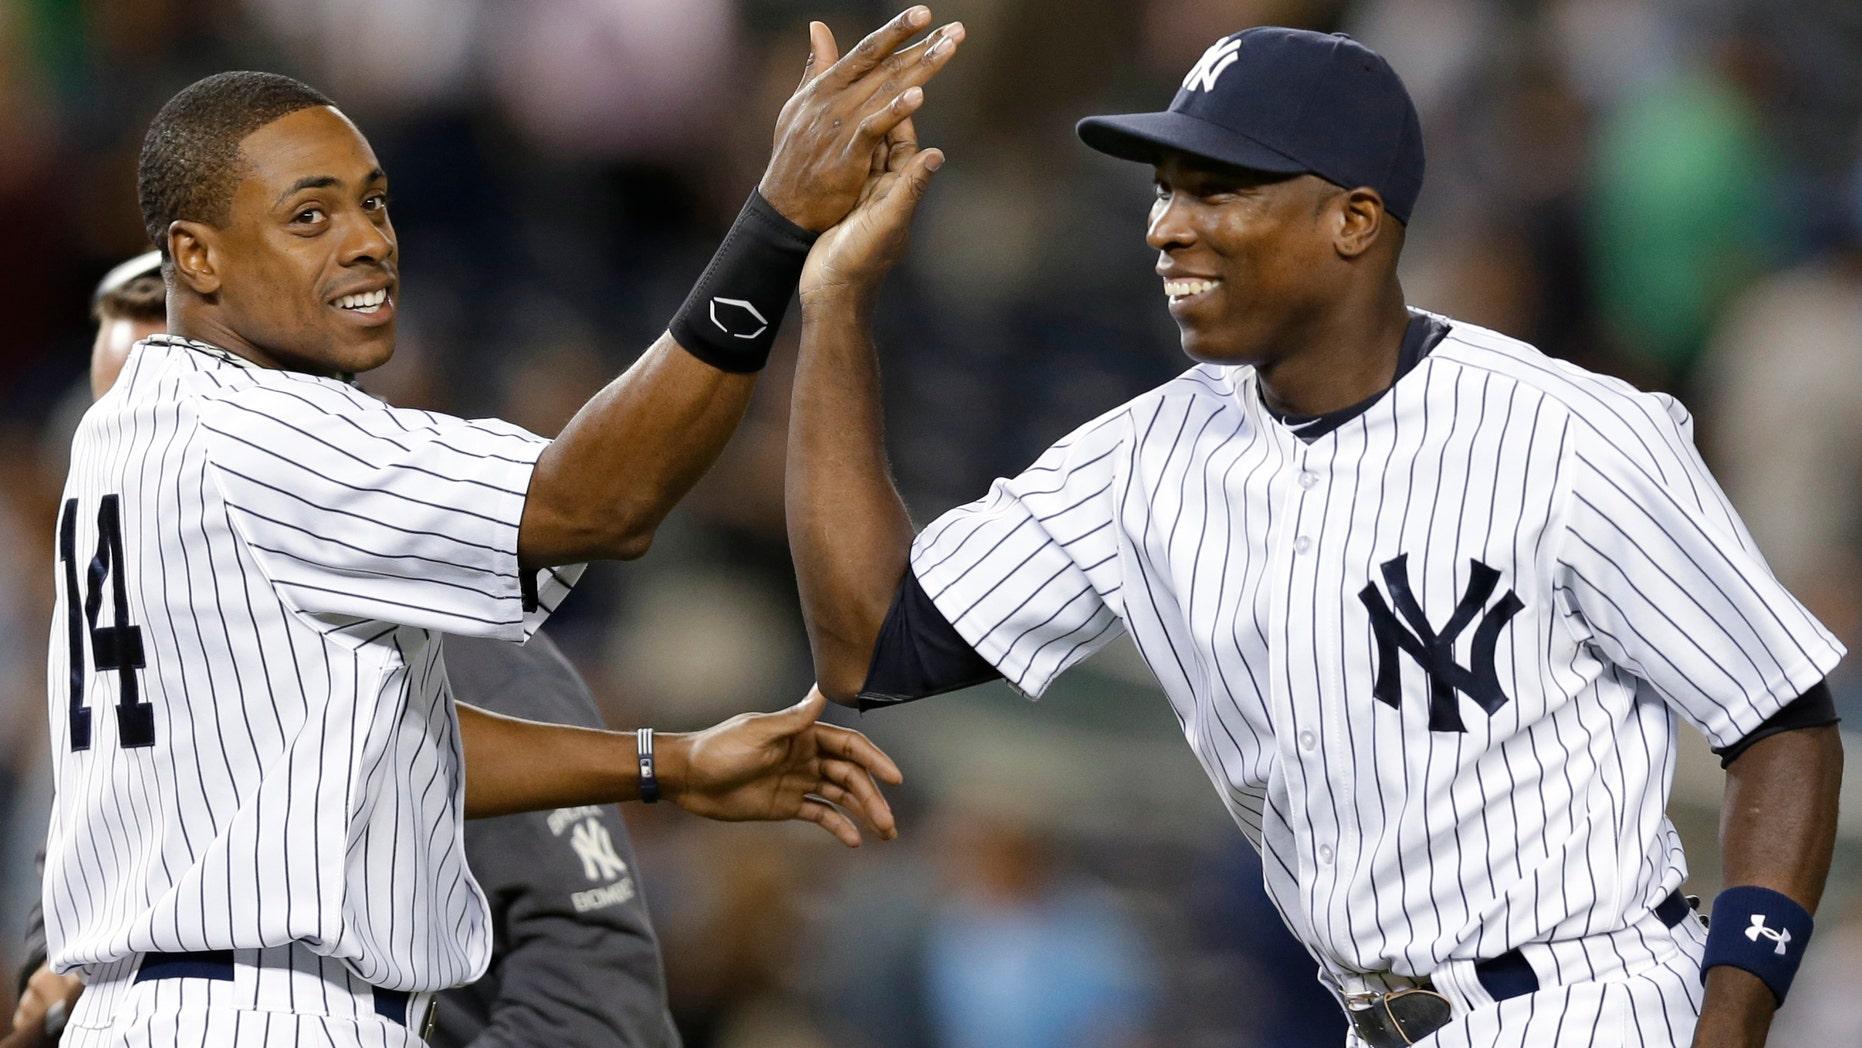 New York Yankees right fielder Curtis Granderson, left, congratulates left fielder Alfonso Soriano. (AP Photo/Kathy Willens)